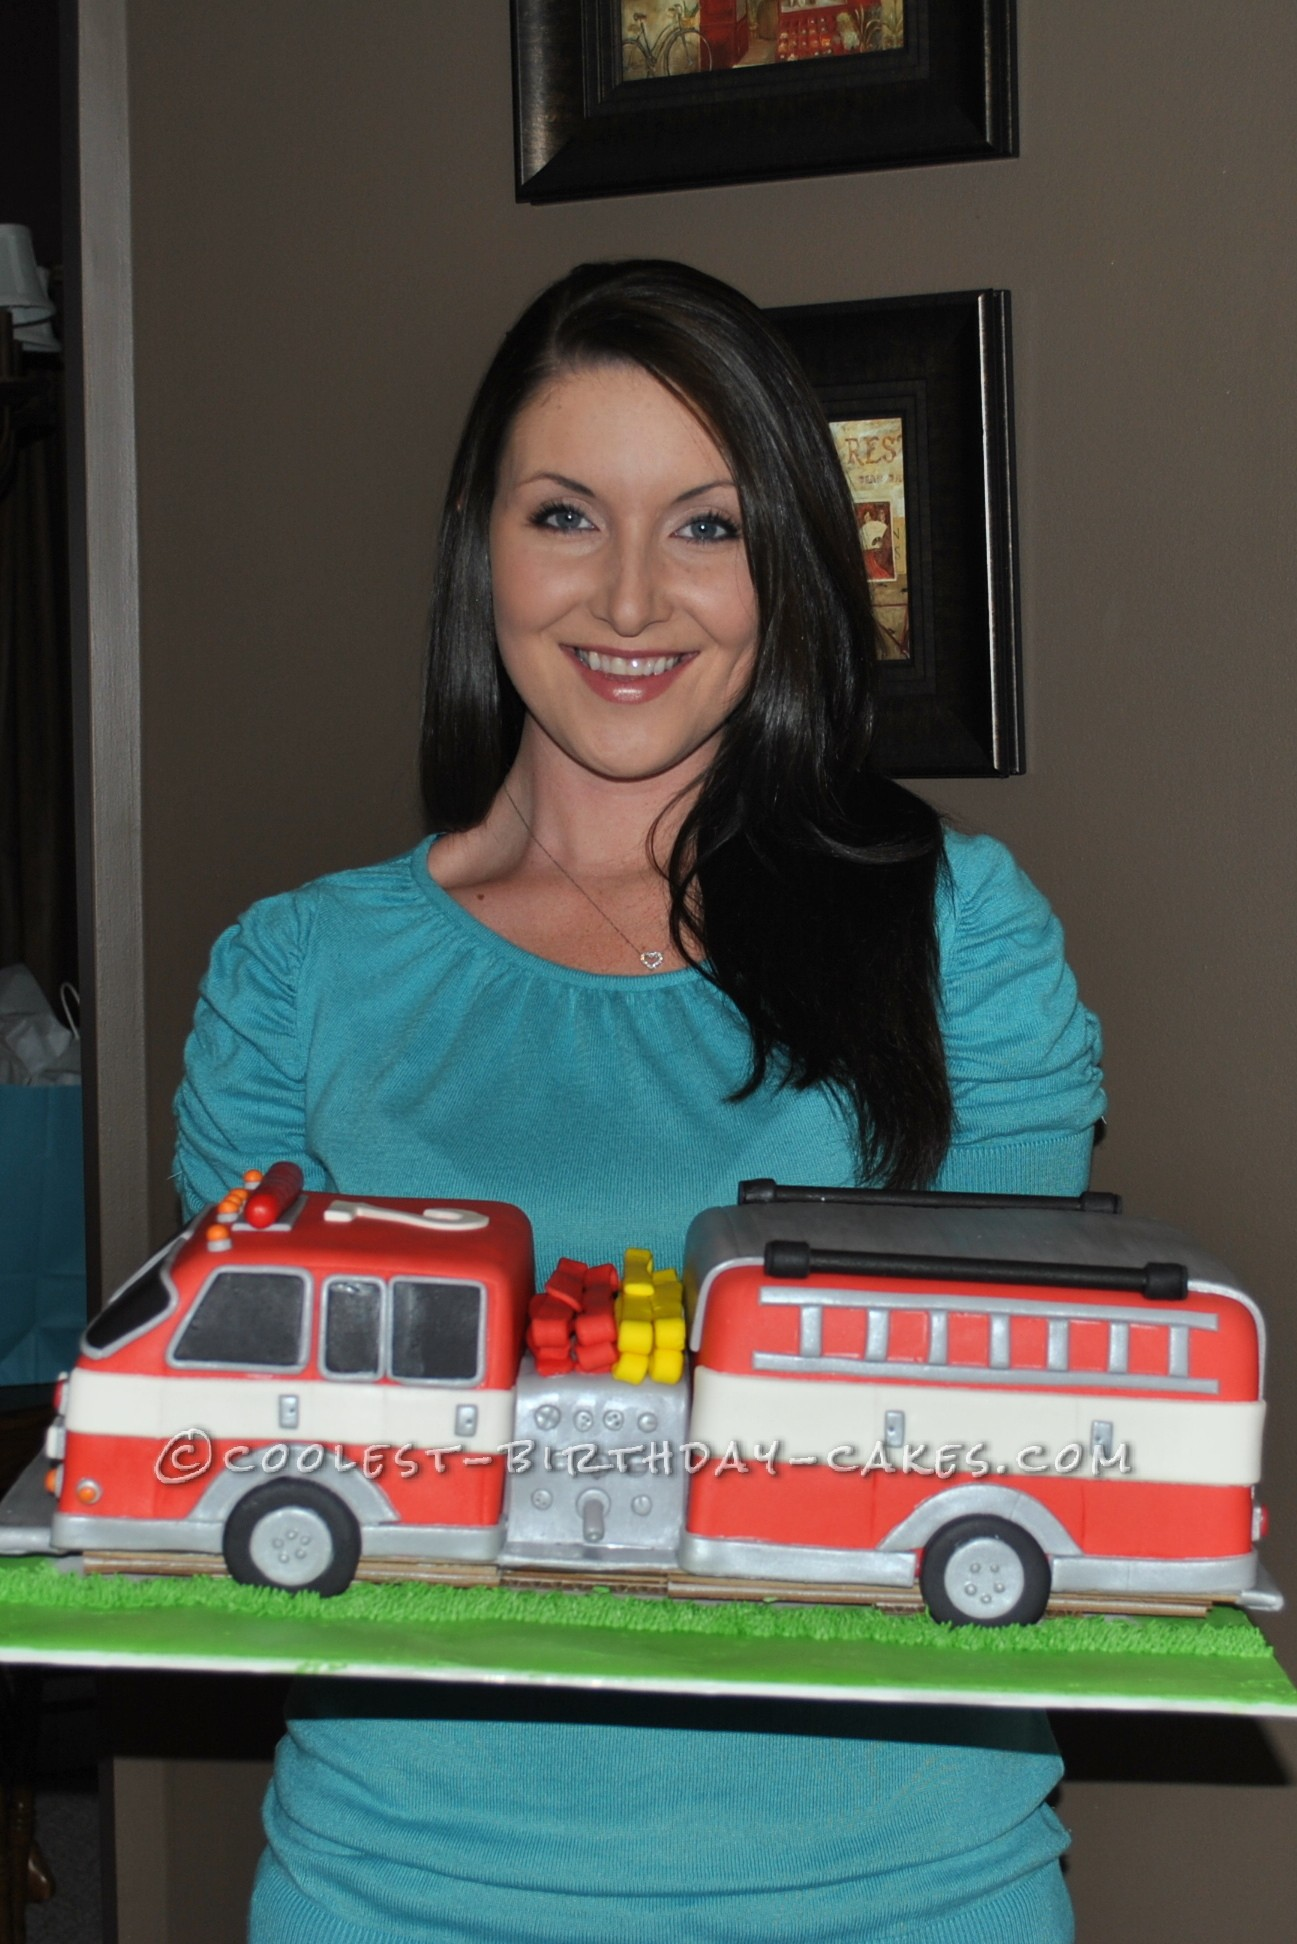 Hope from Birmingham, AL - Featured Cake Decorator